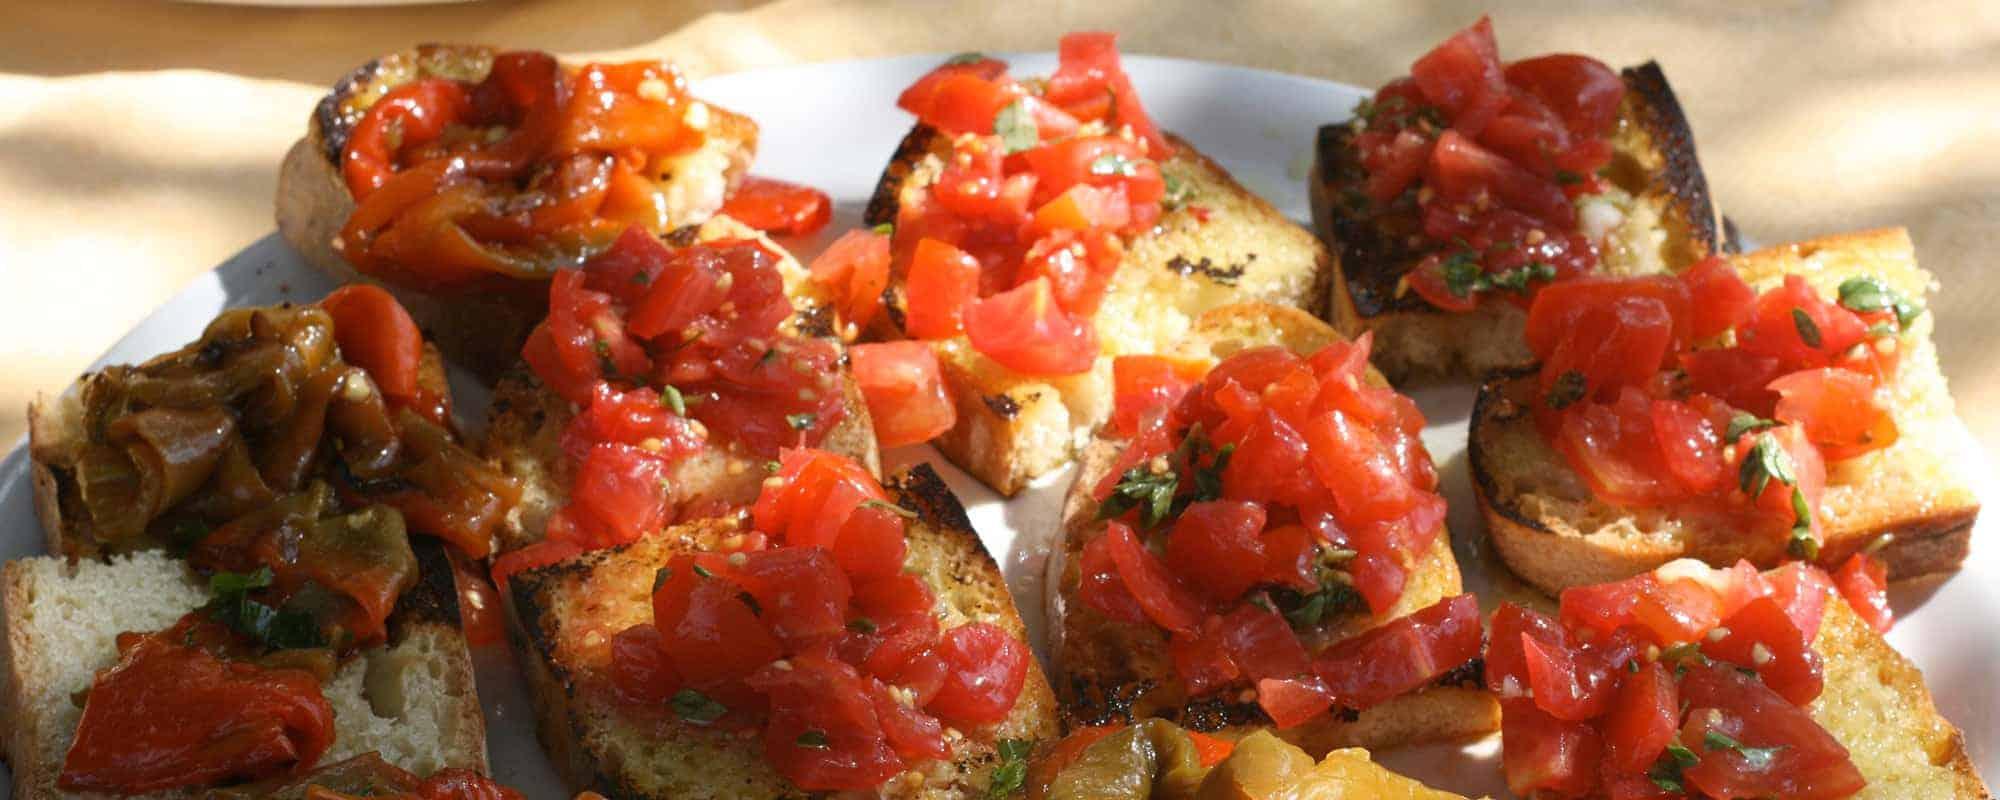 Sicily Cuisine of Sicily, Popular Food of Sicily